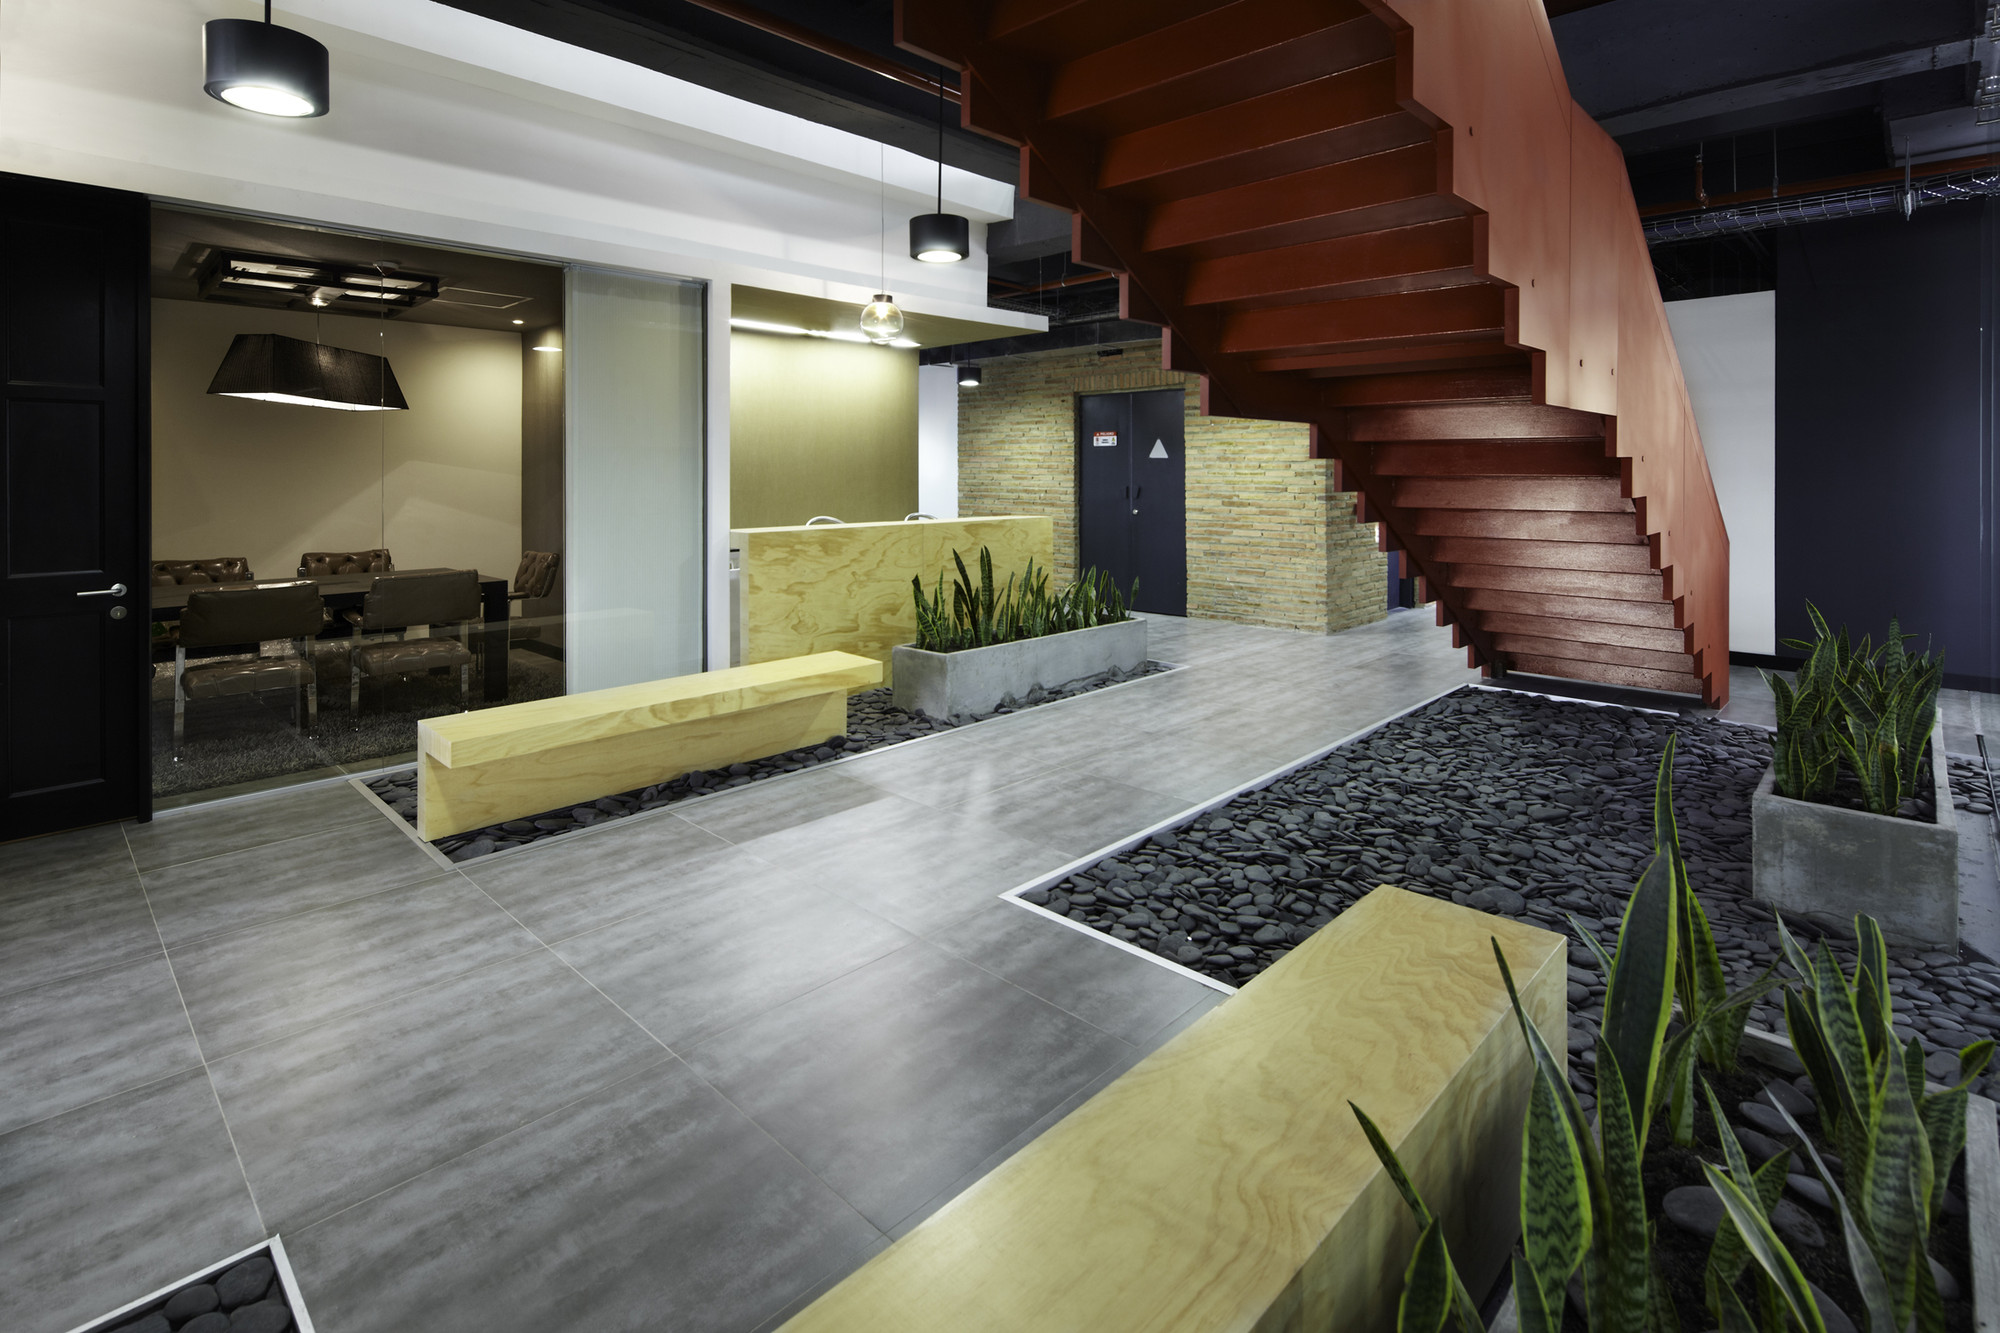 Galer a de oficinas jwt aei arquitectura e interiores 8 for Oficinas interiores